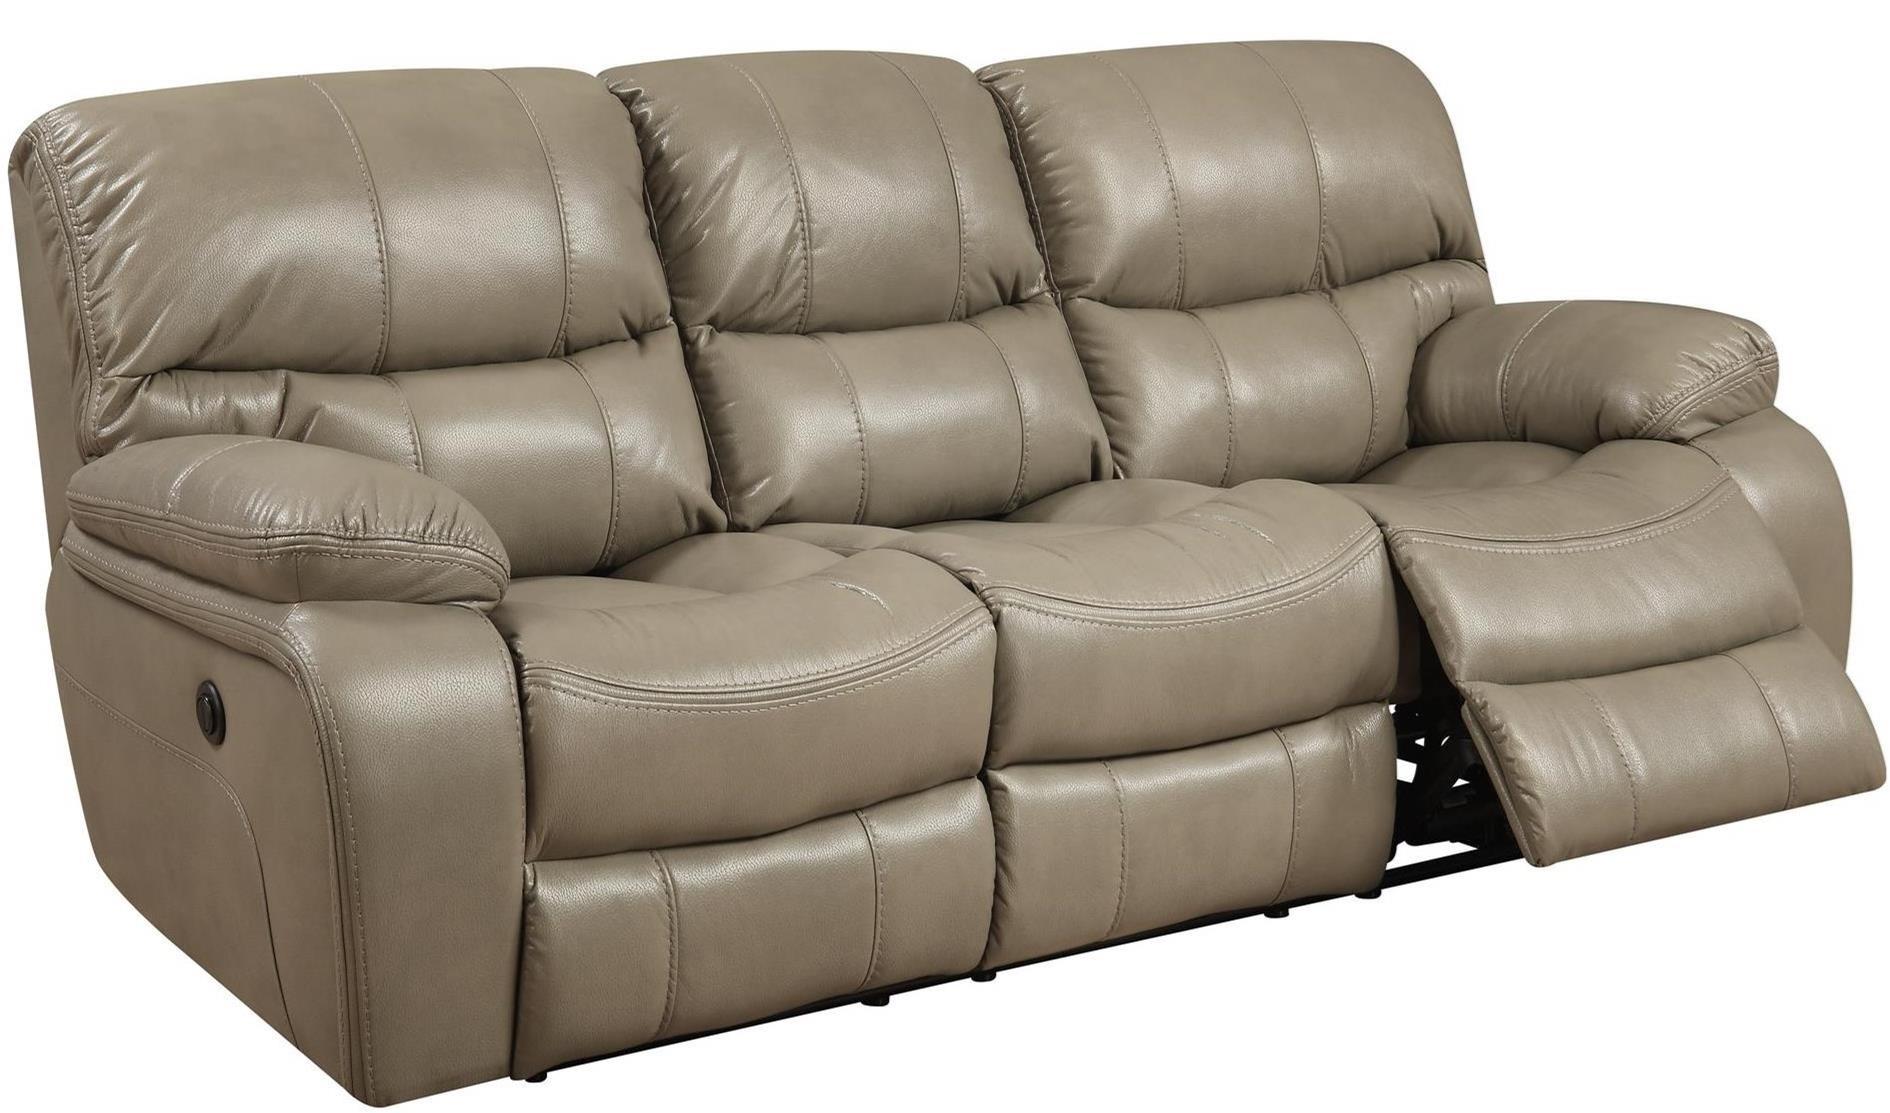 Elements International VinoPower Motion Sofa ...